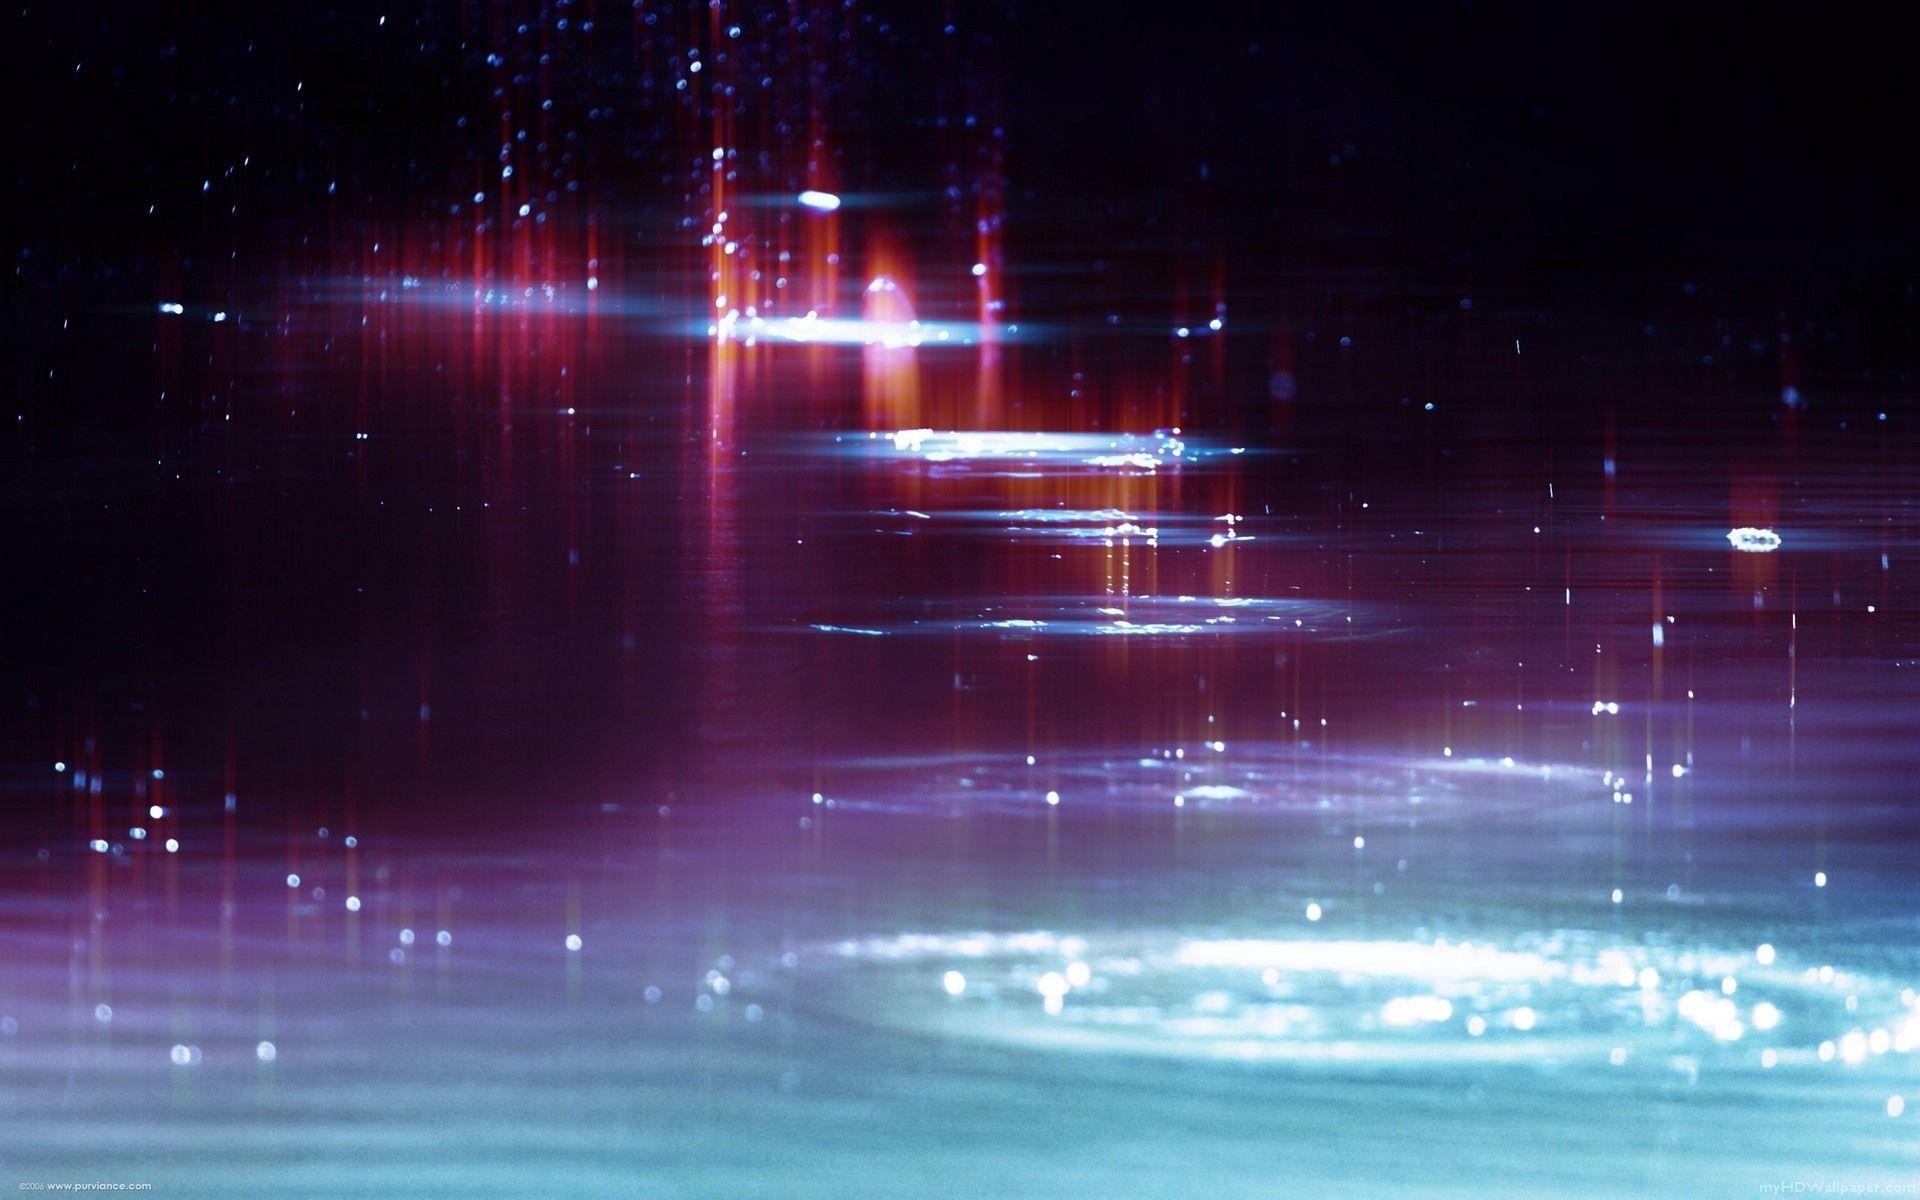 sparkling snow desktop wallpaper - photo #34